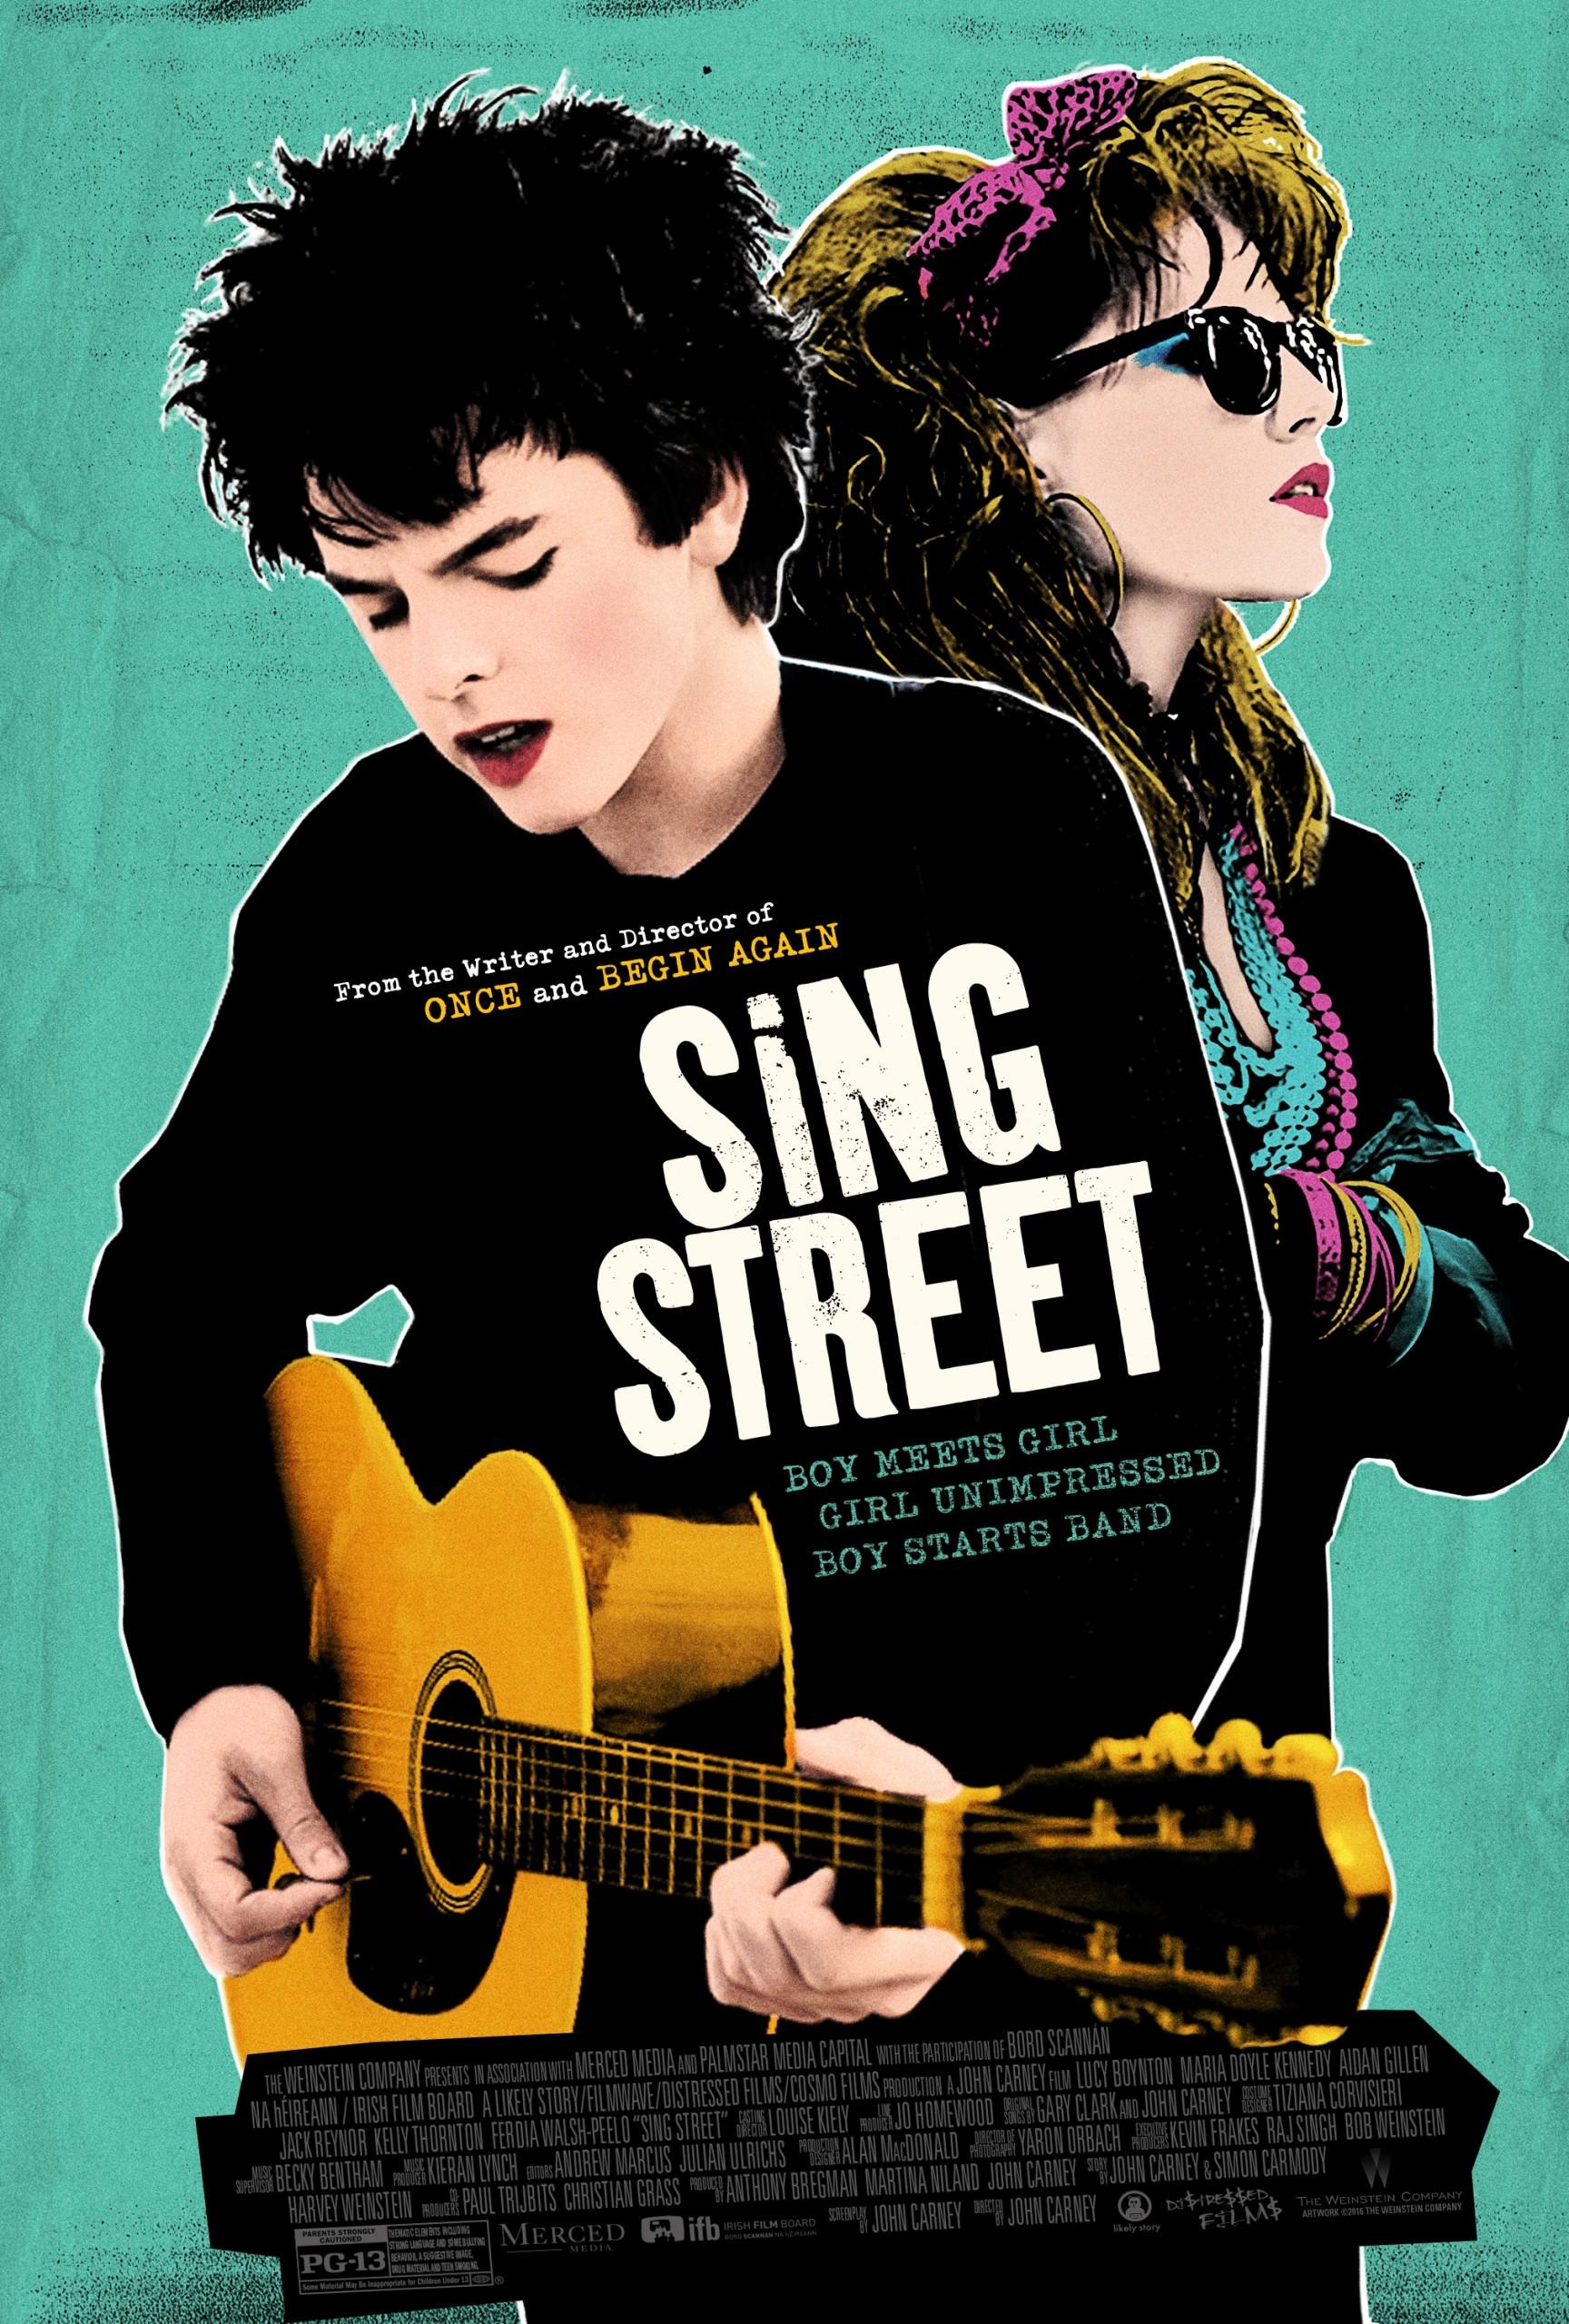 It's Free Movie Monday - 'Sing Street'